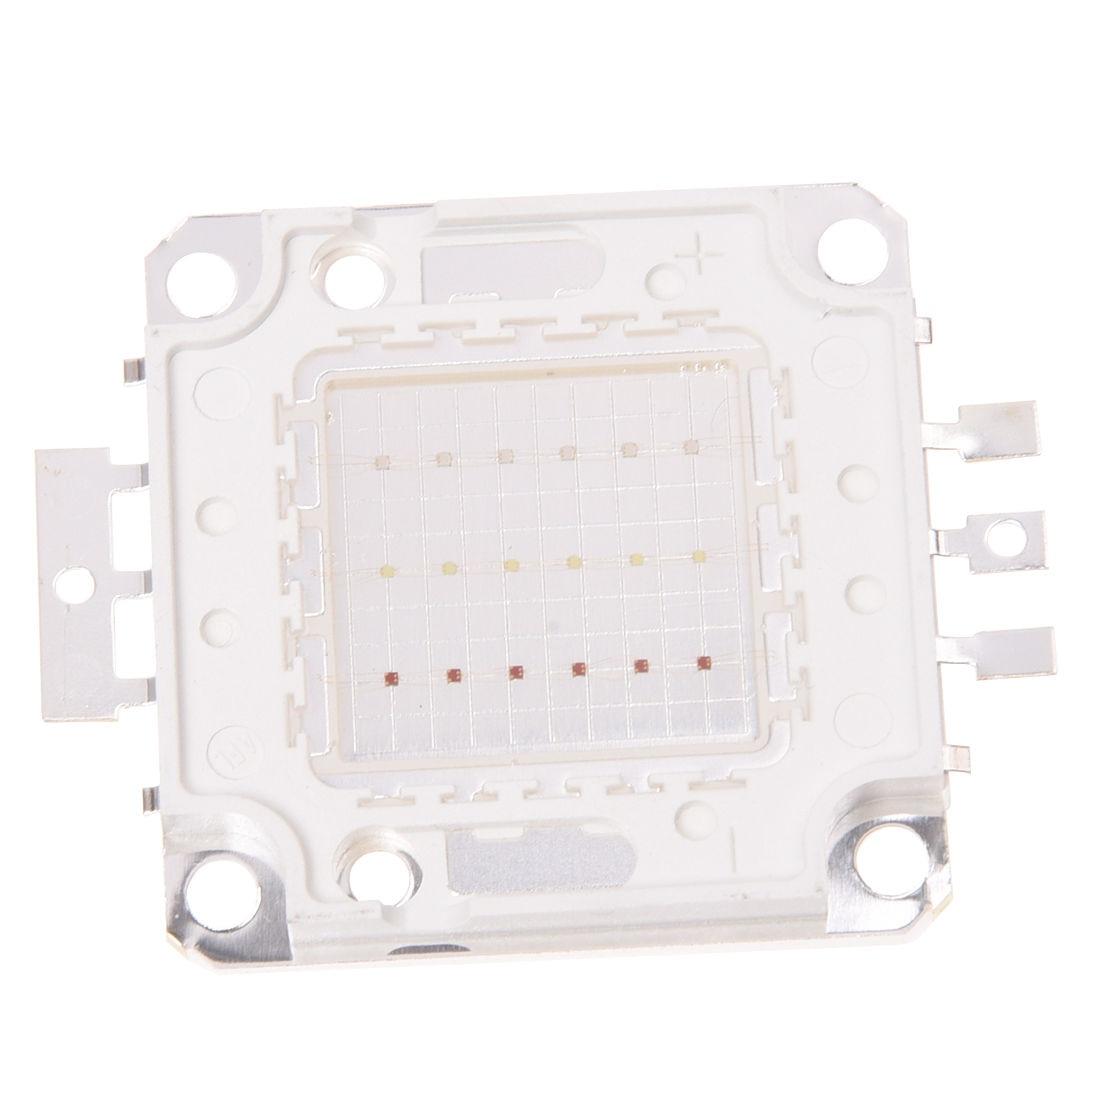 High-power 20W LED RGB chip bulb light lamp spotlight DIY